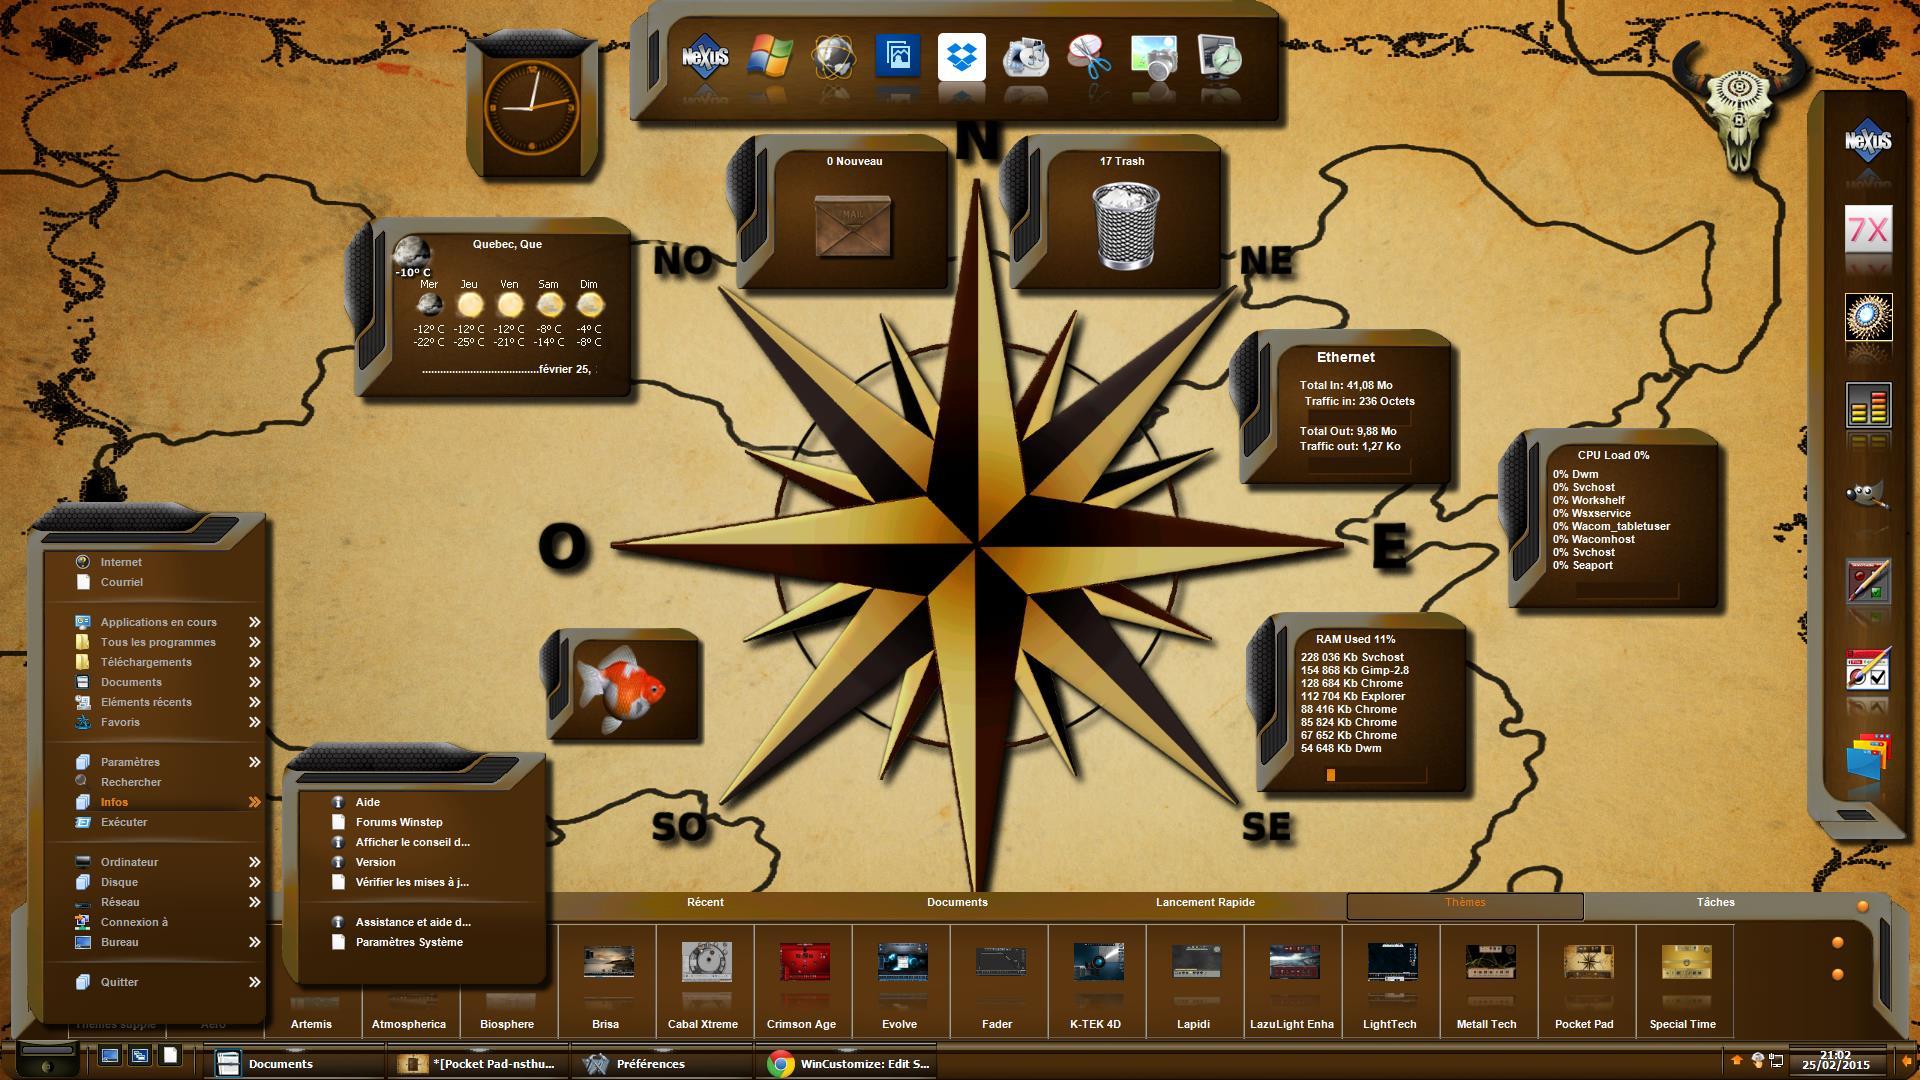 Pocket Pad Xtreme by bleumart